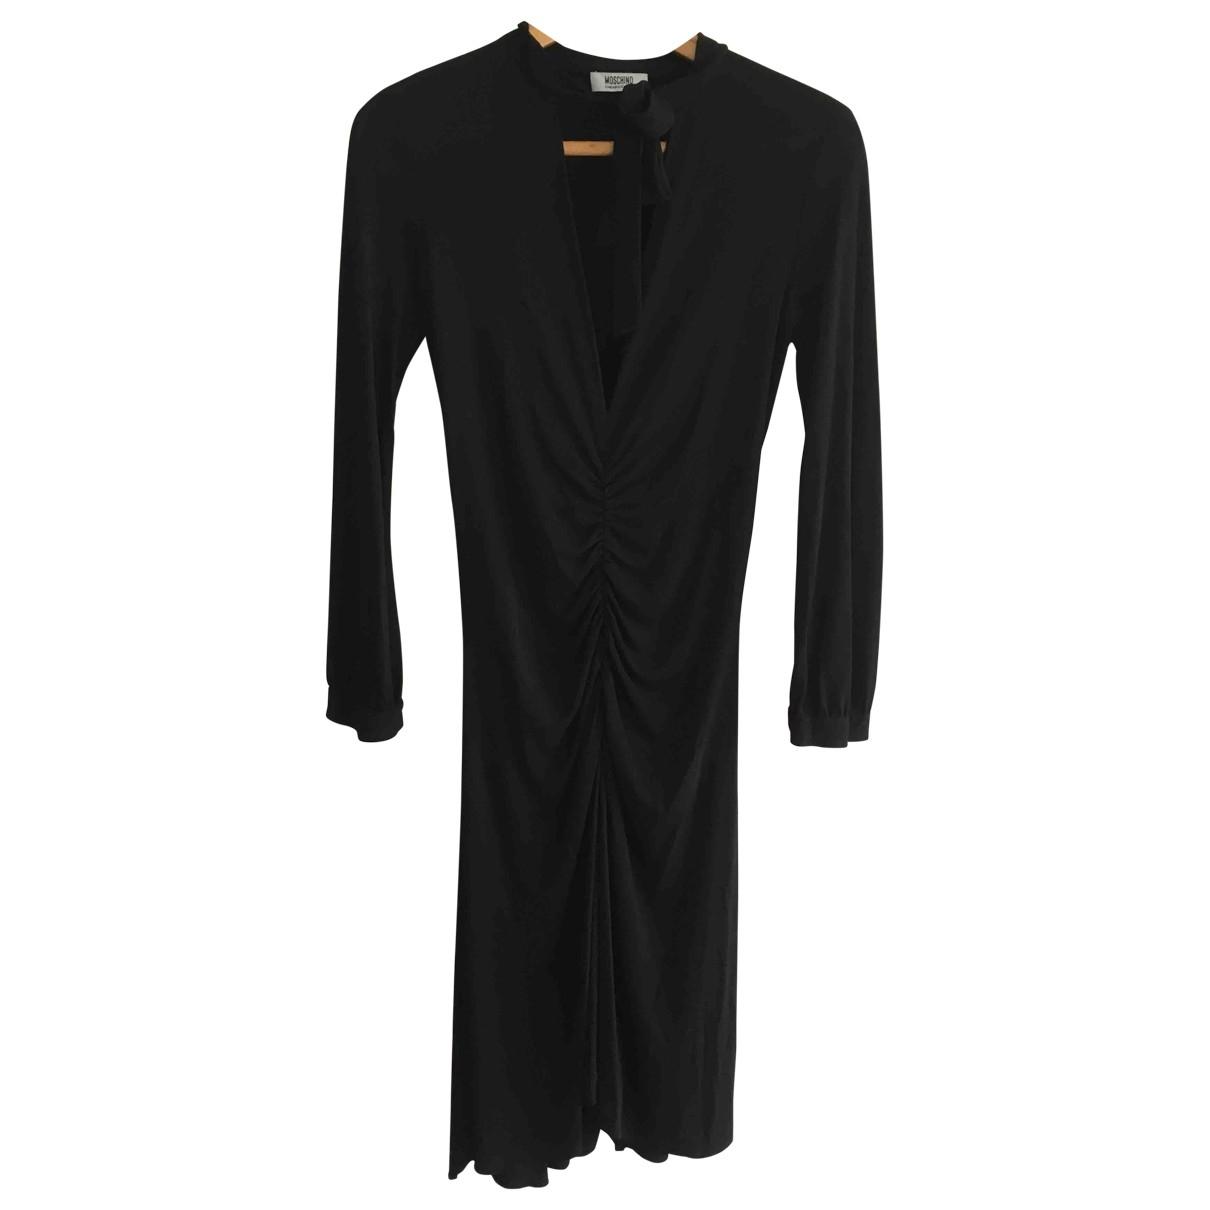 Moschino Cheap And Chic \N Black dress for Women 10 UK